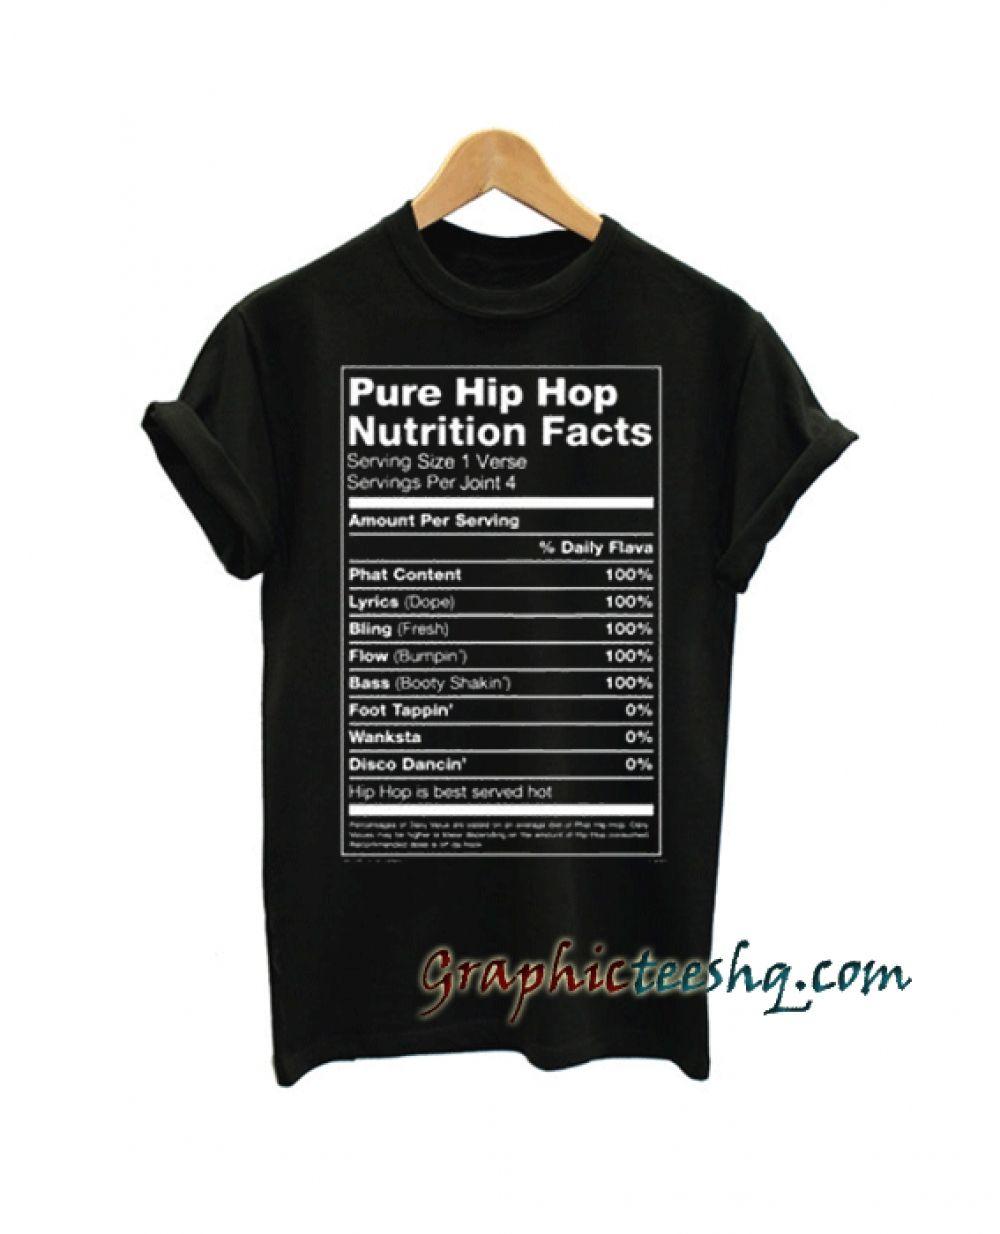 da897b27 Pure Hip Hop Nutrition Facts Tee Shirt Price: 13.50 #style #fashion #tshirts  #tee #tshirtdesign#instafashion #black #cute #art #amazing#funny  #webstagram ...